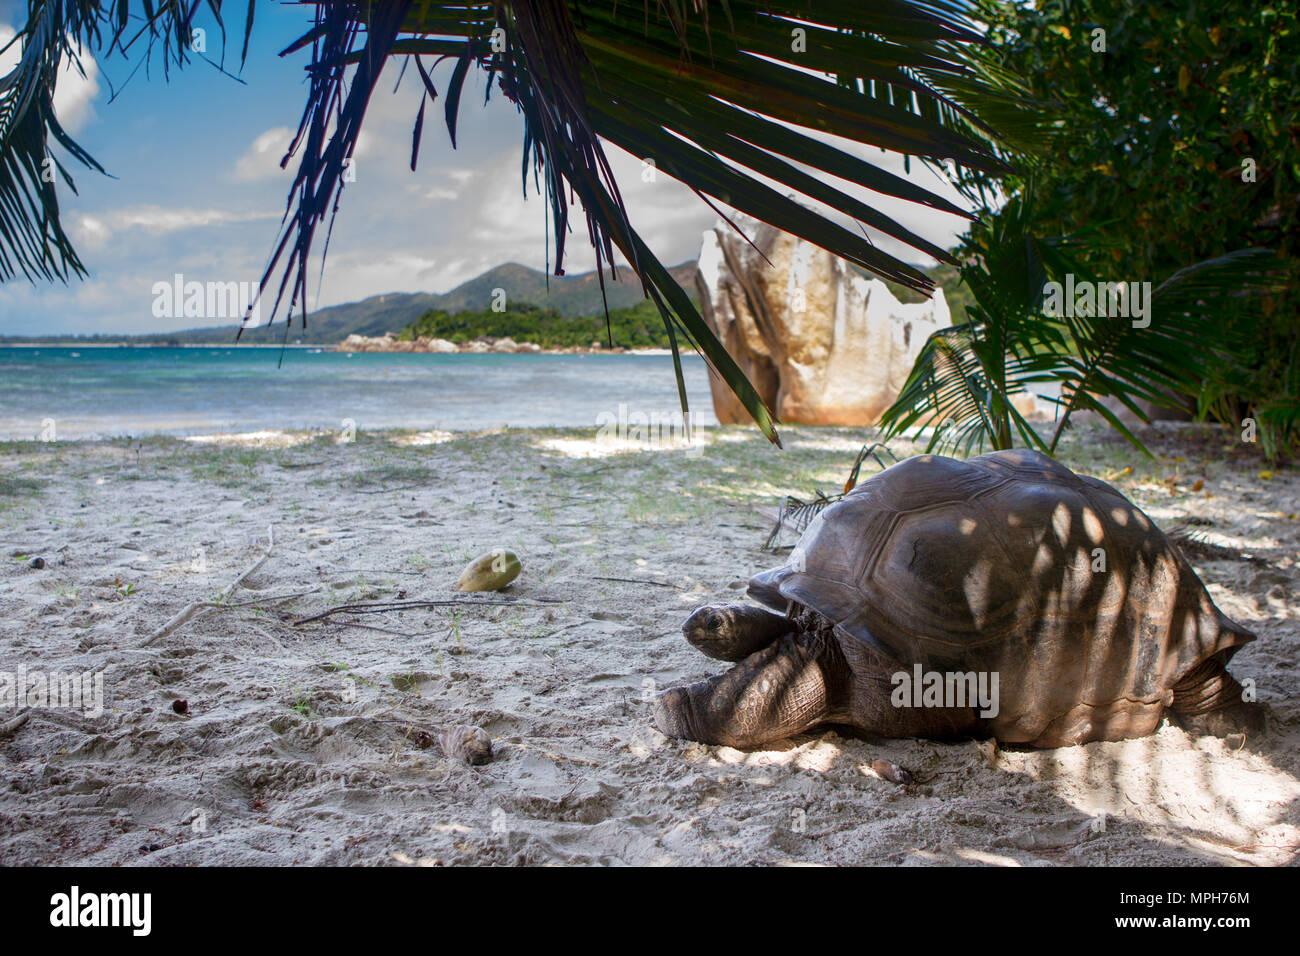 Aldabra giant tortoise (Aldabrachelys gigantea) on the beach on Curieuse, Seychelles. Stock Photo